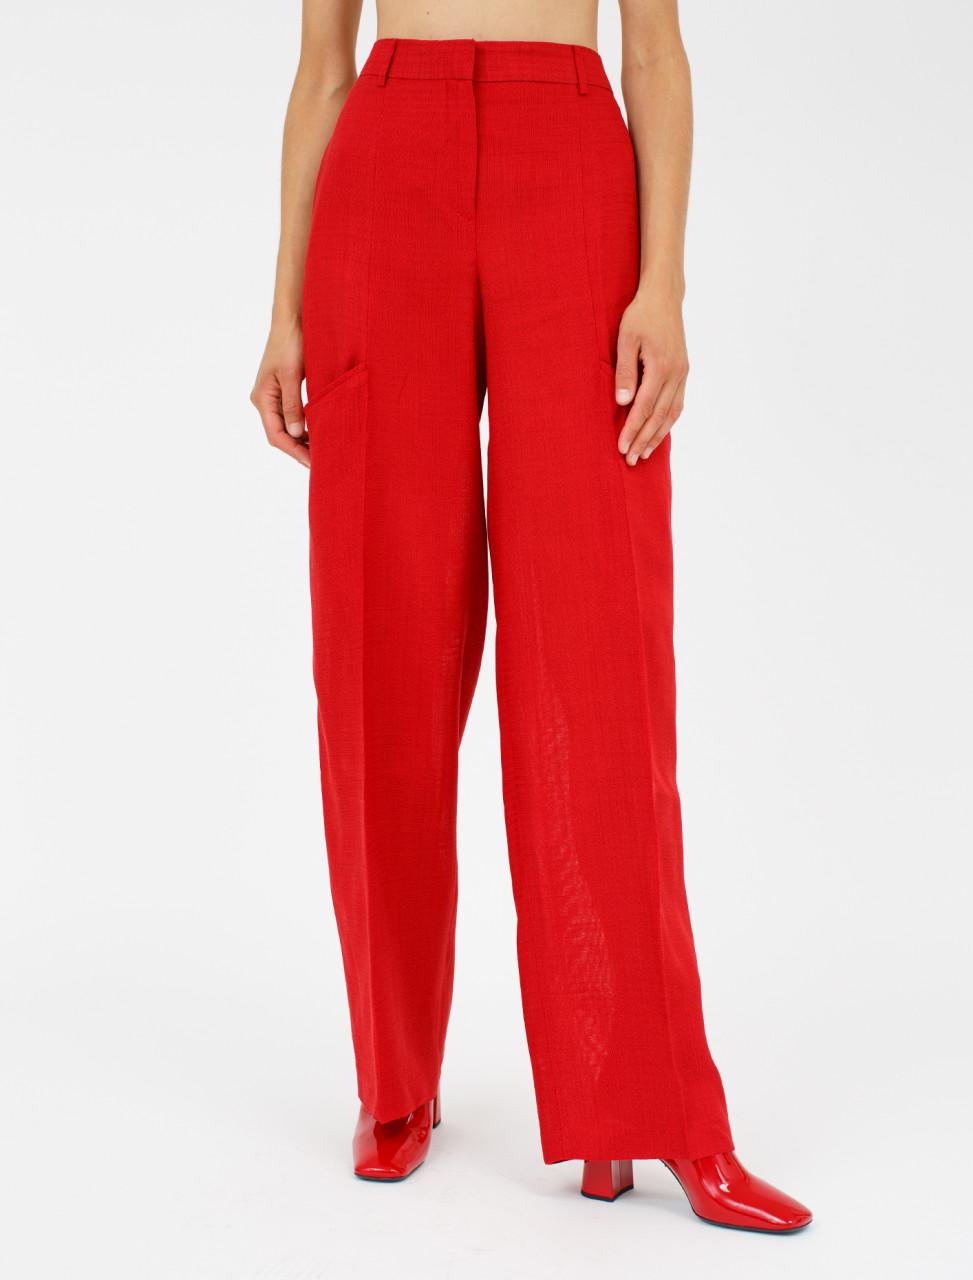 Le Pantalon Moyo